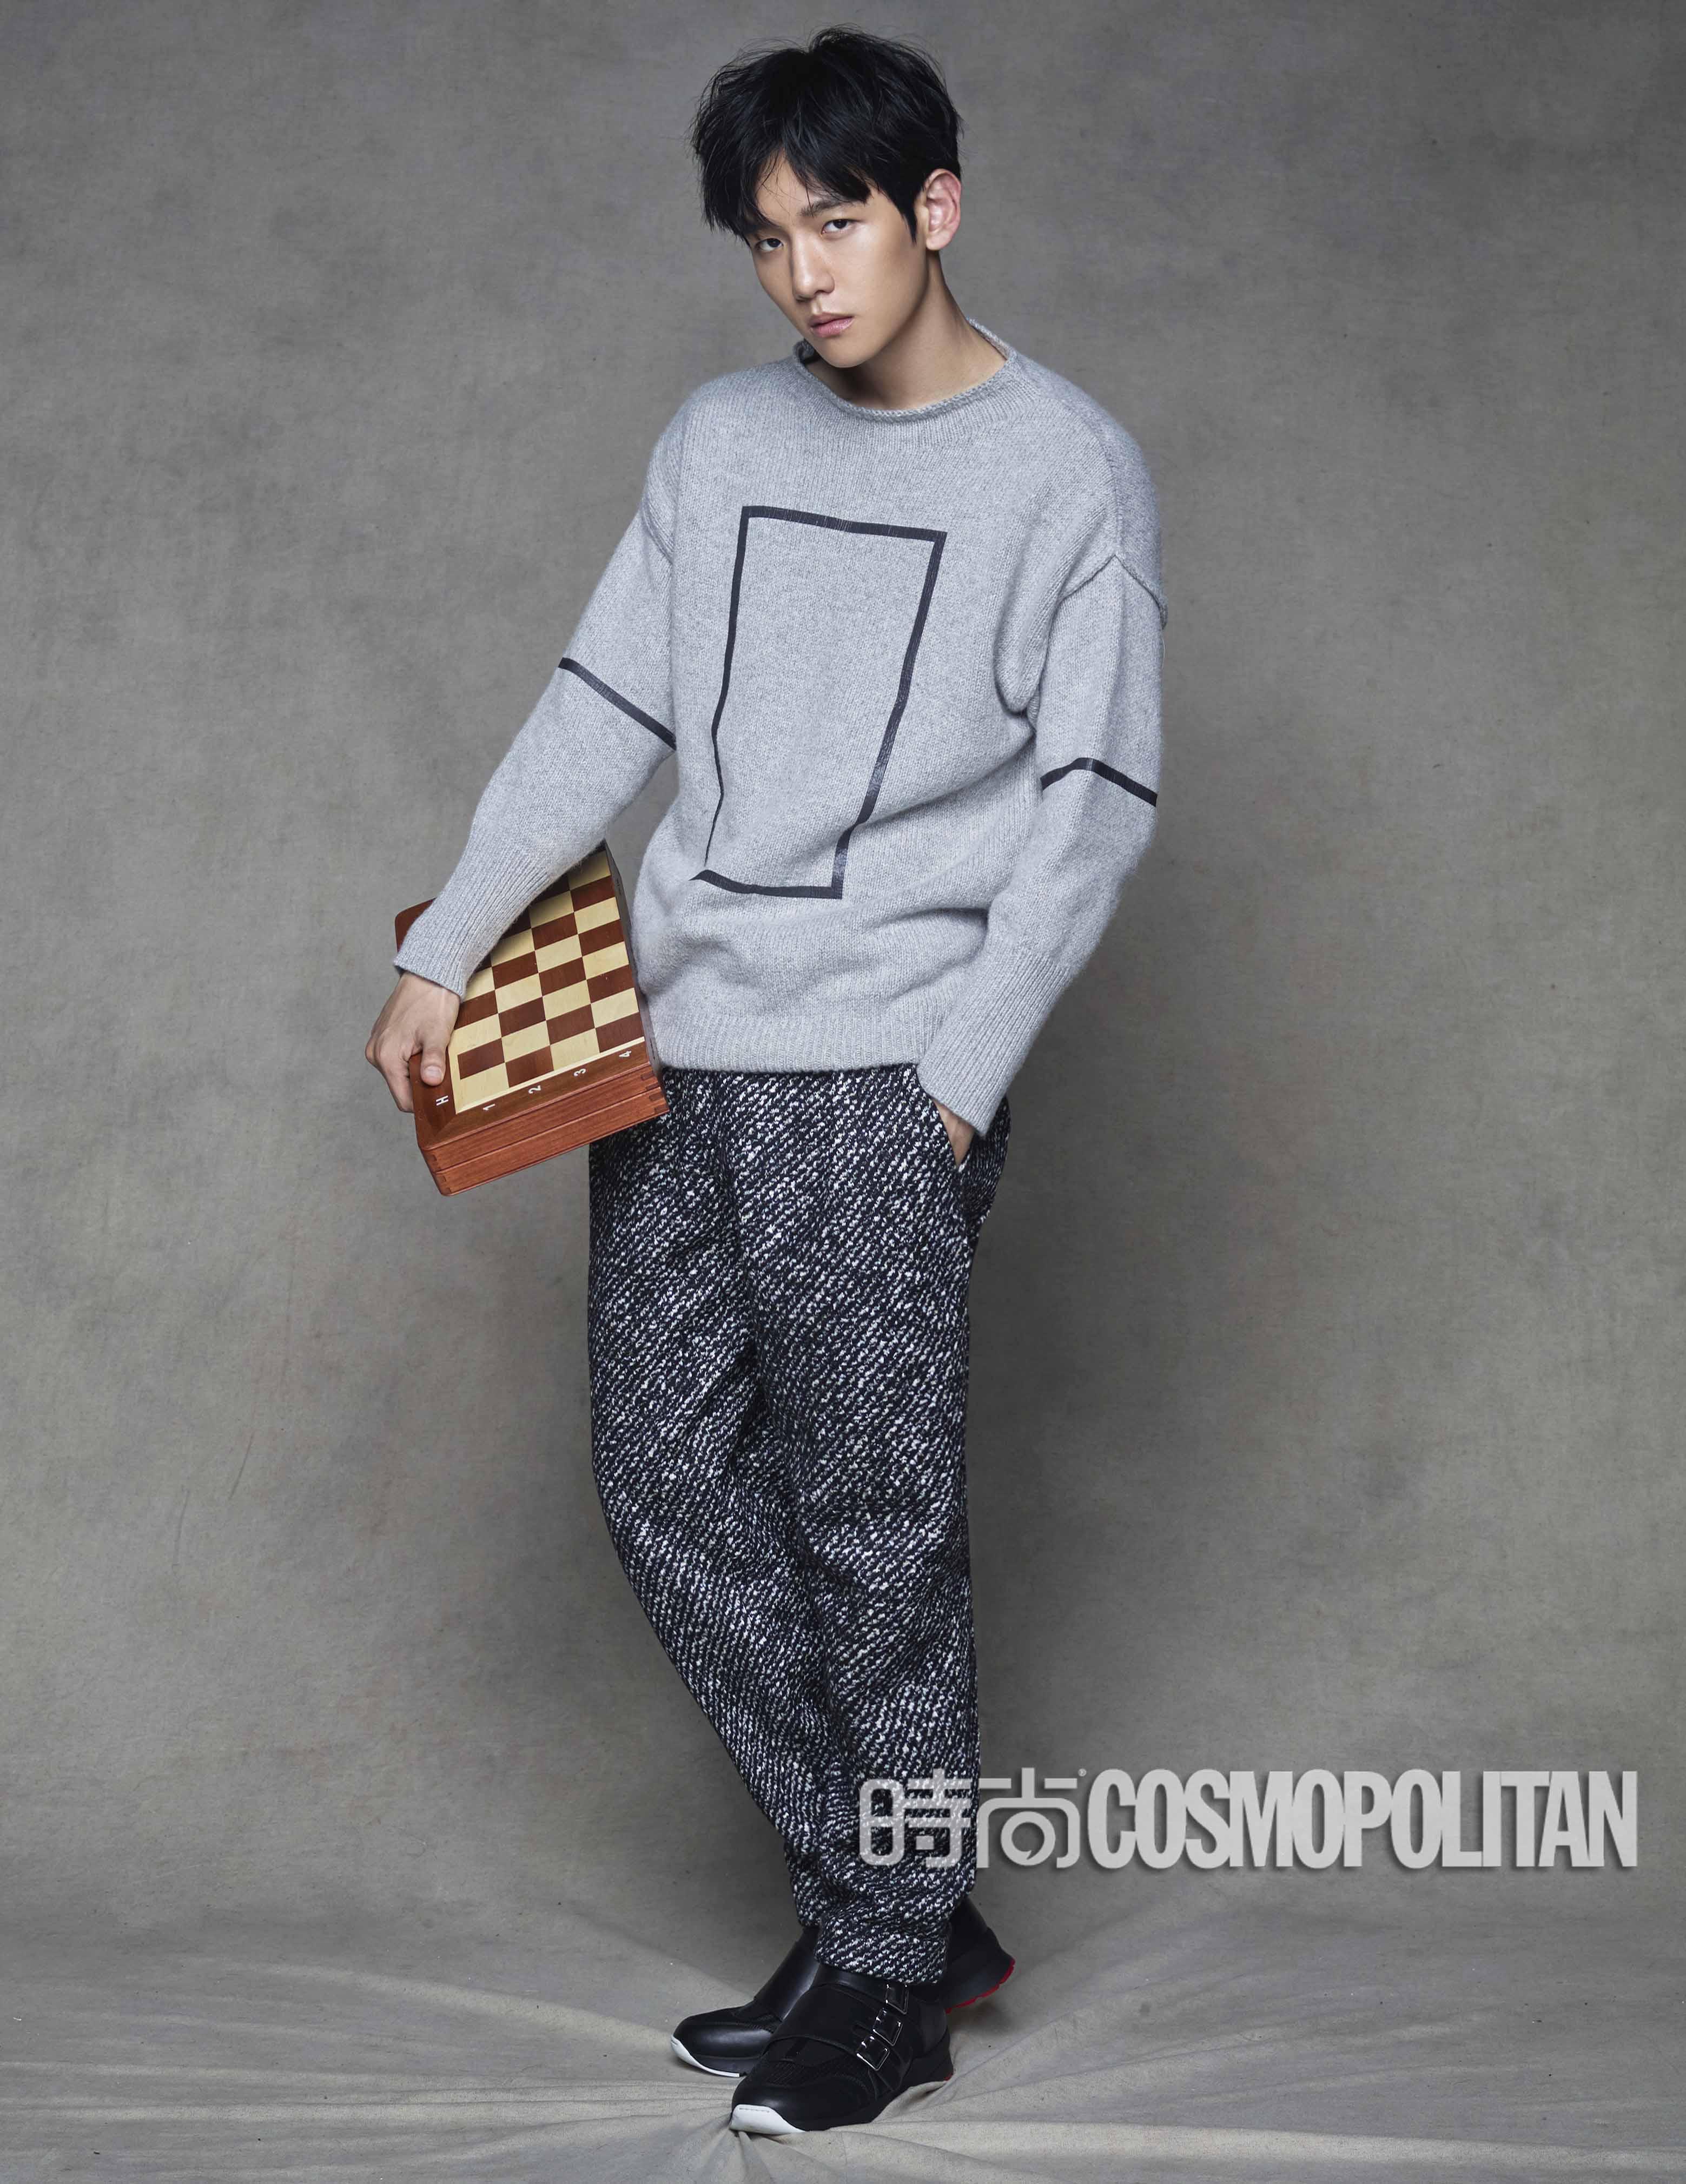 Byun Baekhyun Android Iphone Wallpaper 66122 Asiachan Kpop Image